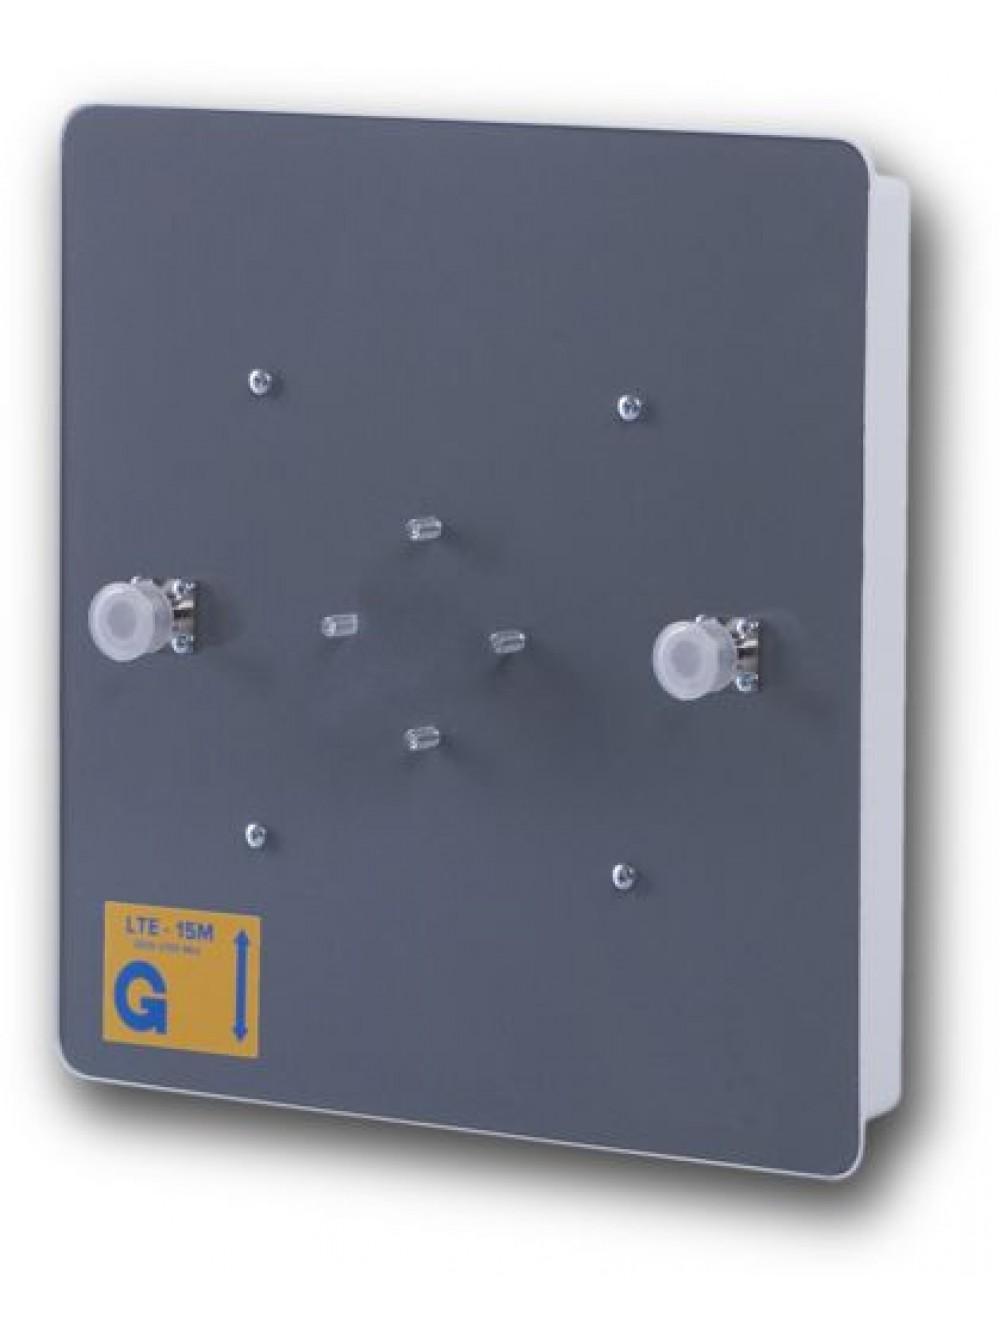 Антенна 4G (15 дБ) MIMO Gellan LTE-15M: http://domantenn.ru/catalog/for_4g_wimax_lte/antenna_4g_15_db_mimo_gellan_lte_15m/